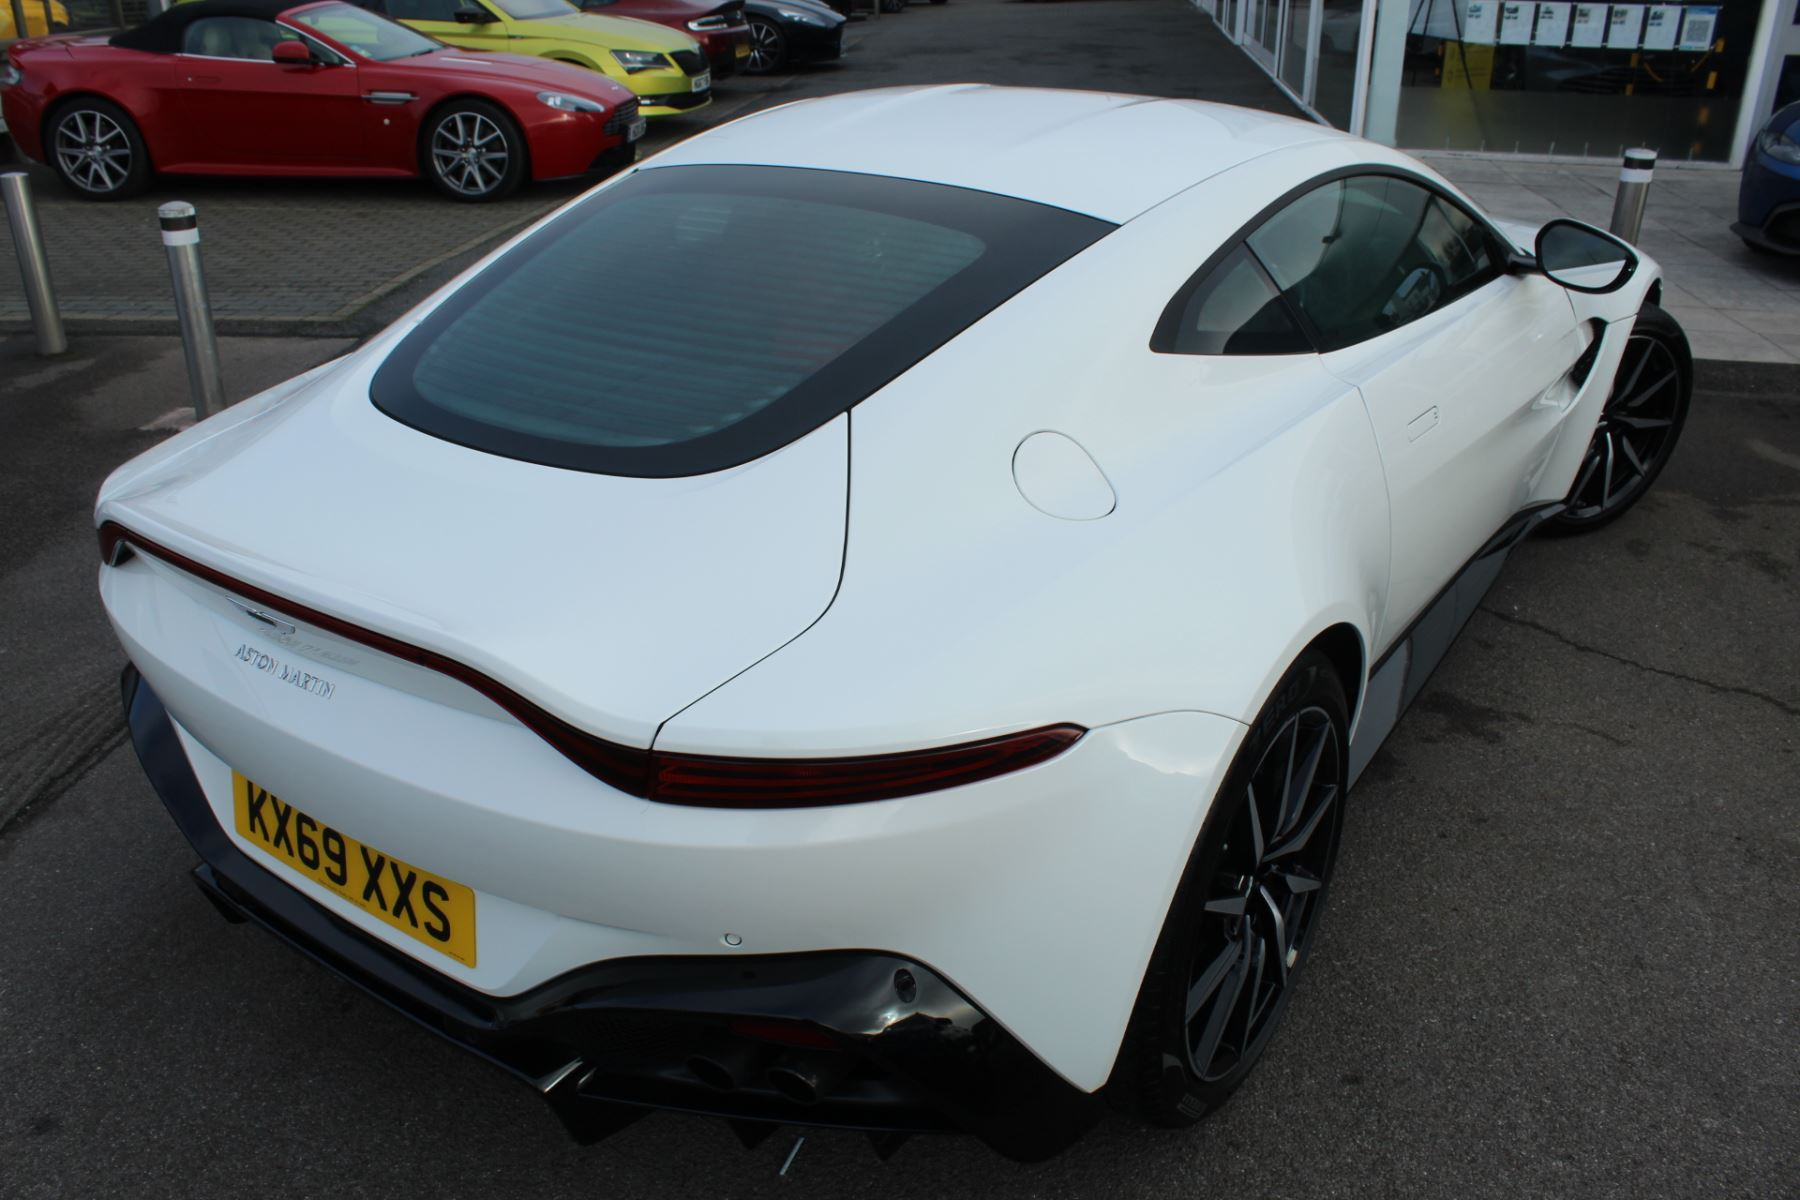 Aston Martin New Vantage 2dr ZF 8 Speed image 10